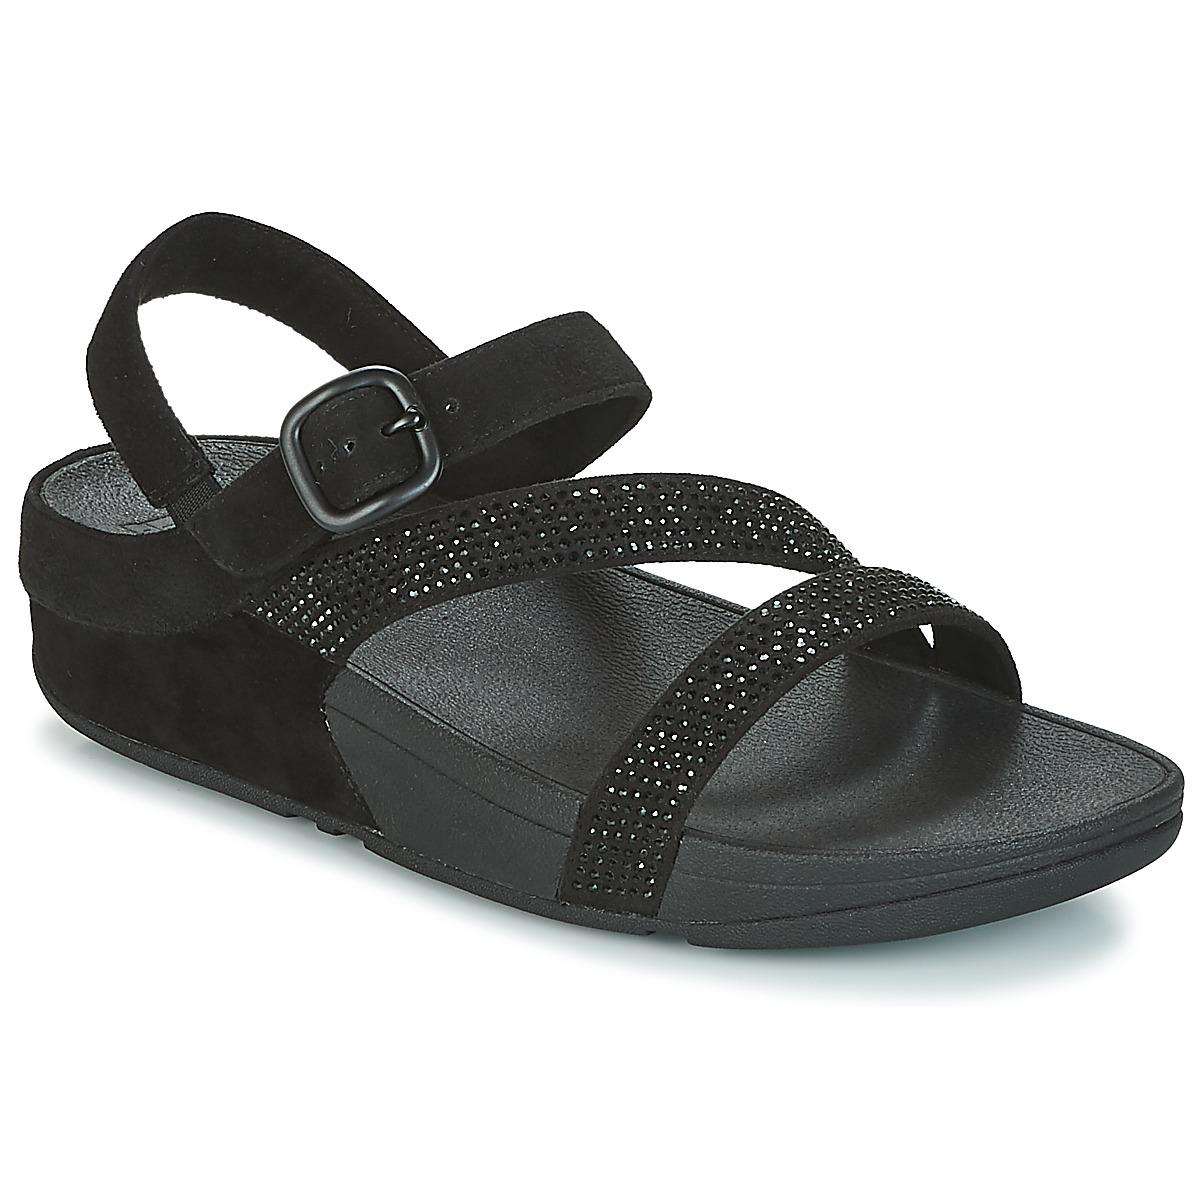 9aa8e04bbc03 Fitflop Slinky Rokkit Women s Sandals In Black in Black - Save 18 ...